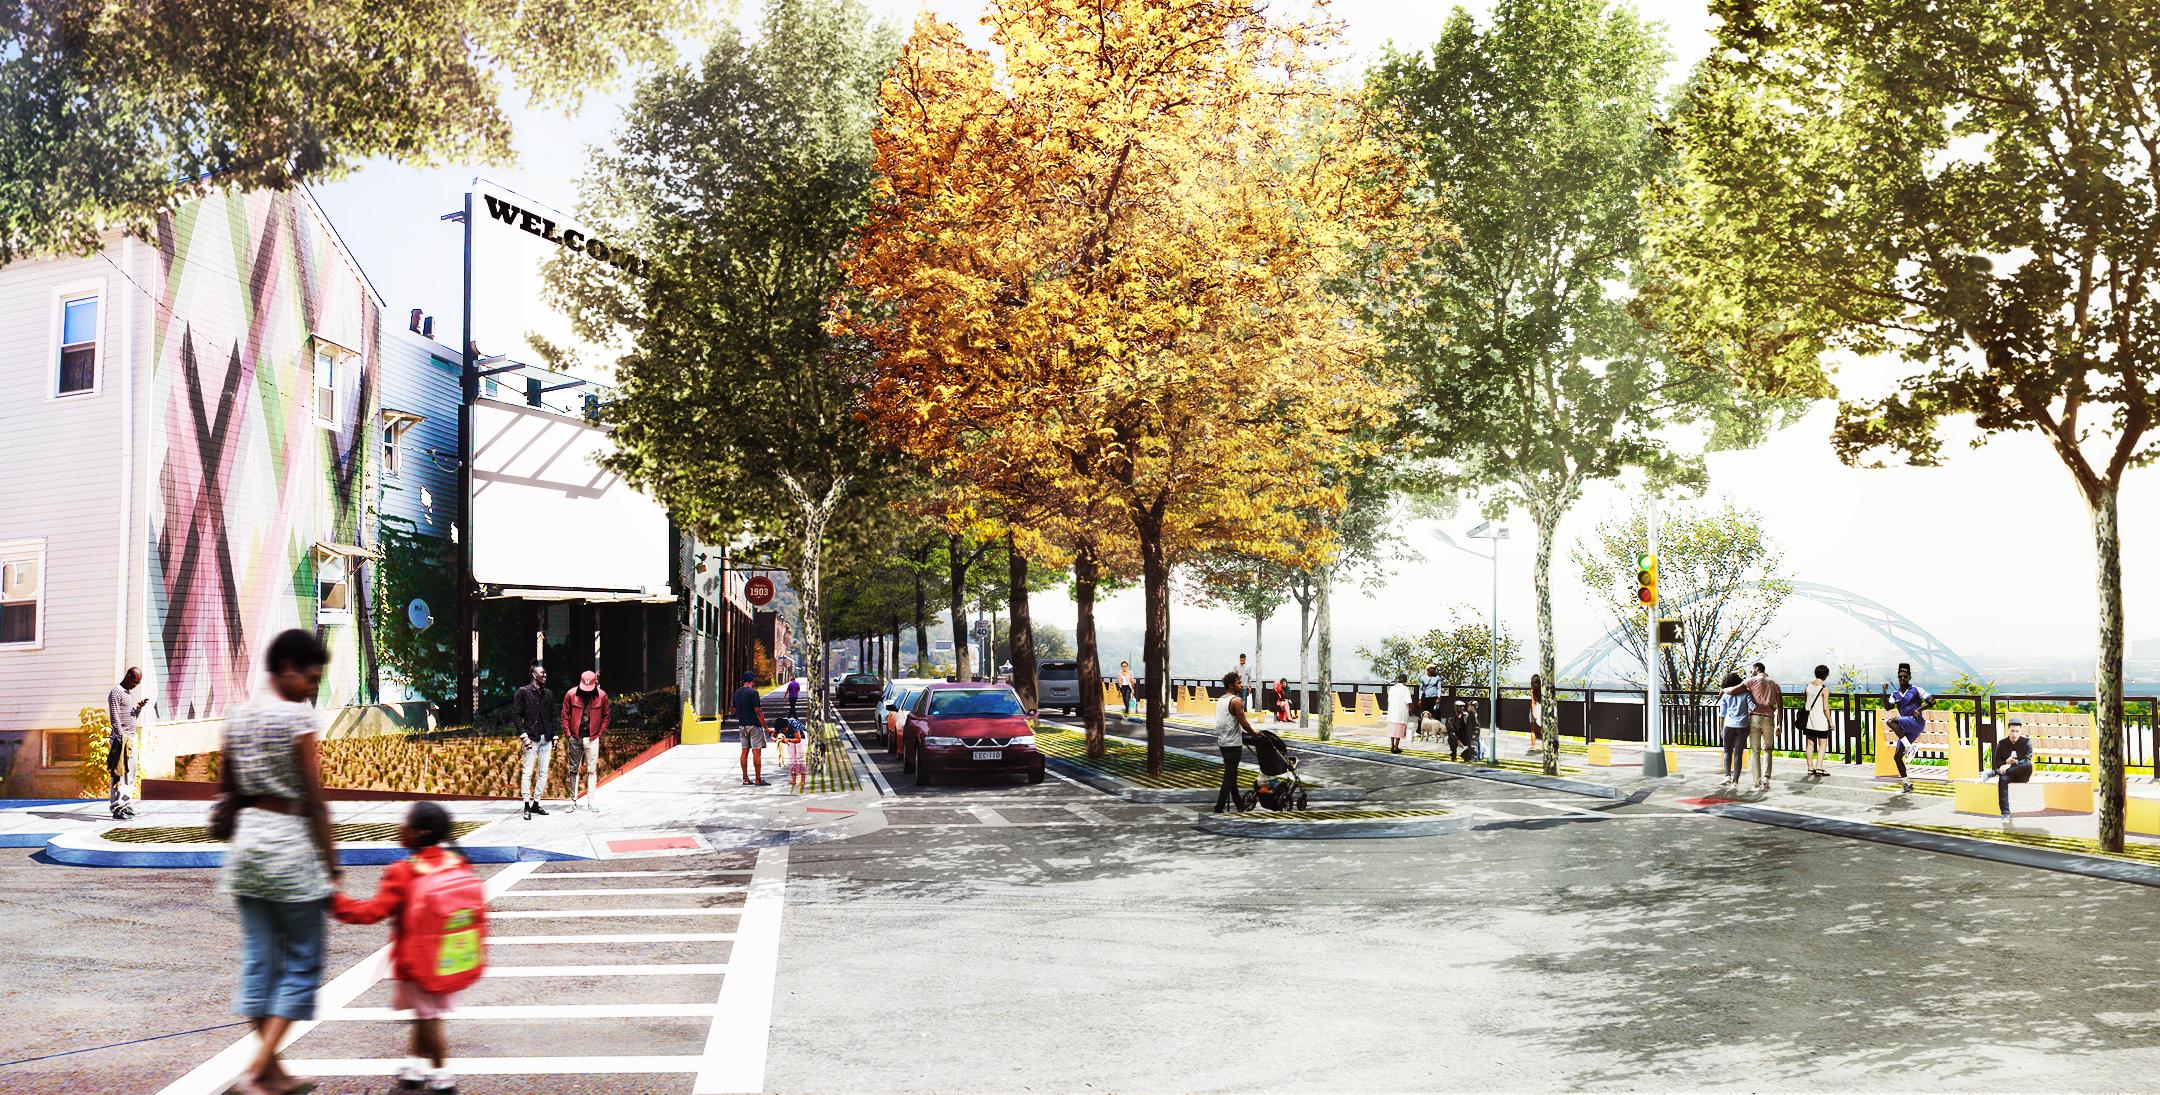 Pittsburgh Image 1.jpg